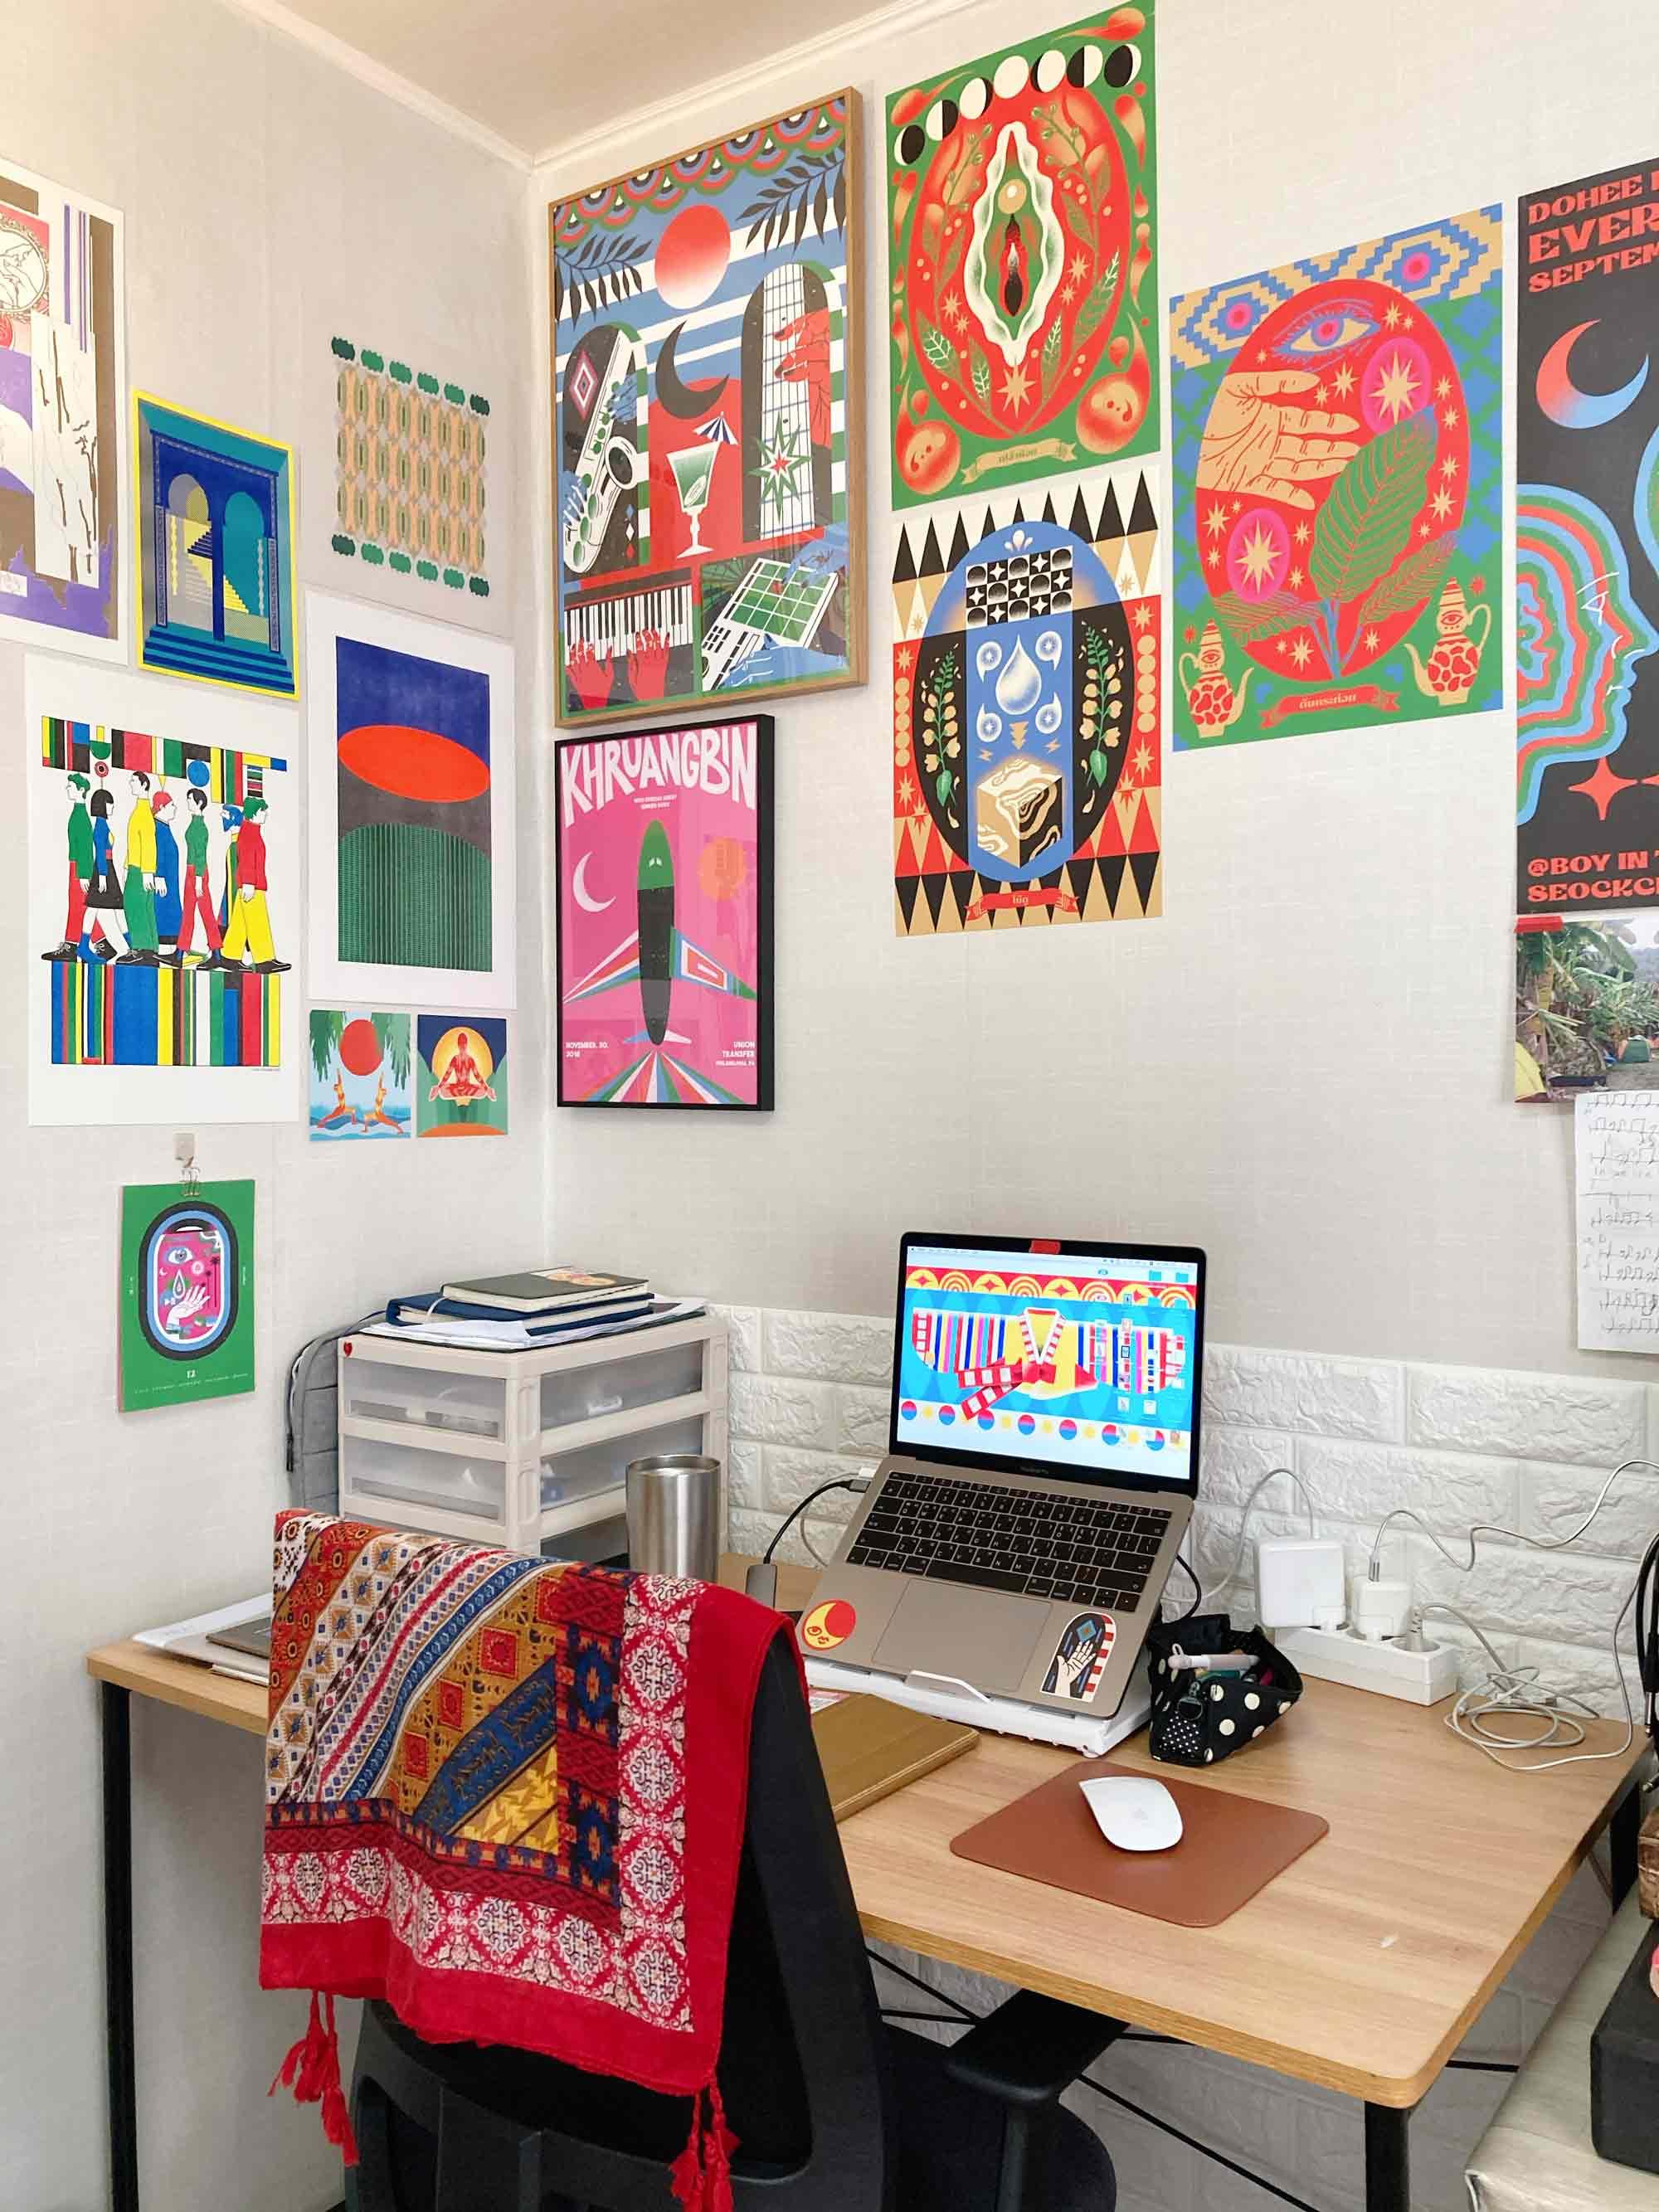 everpress-blog-process-dohee-kwon-workspace